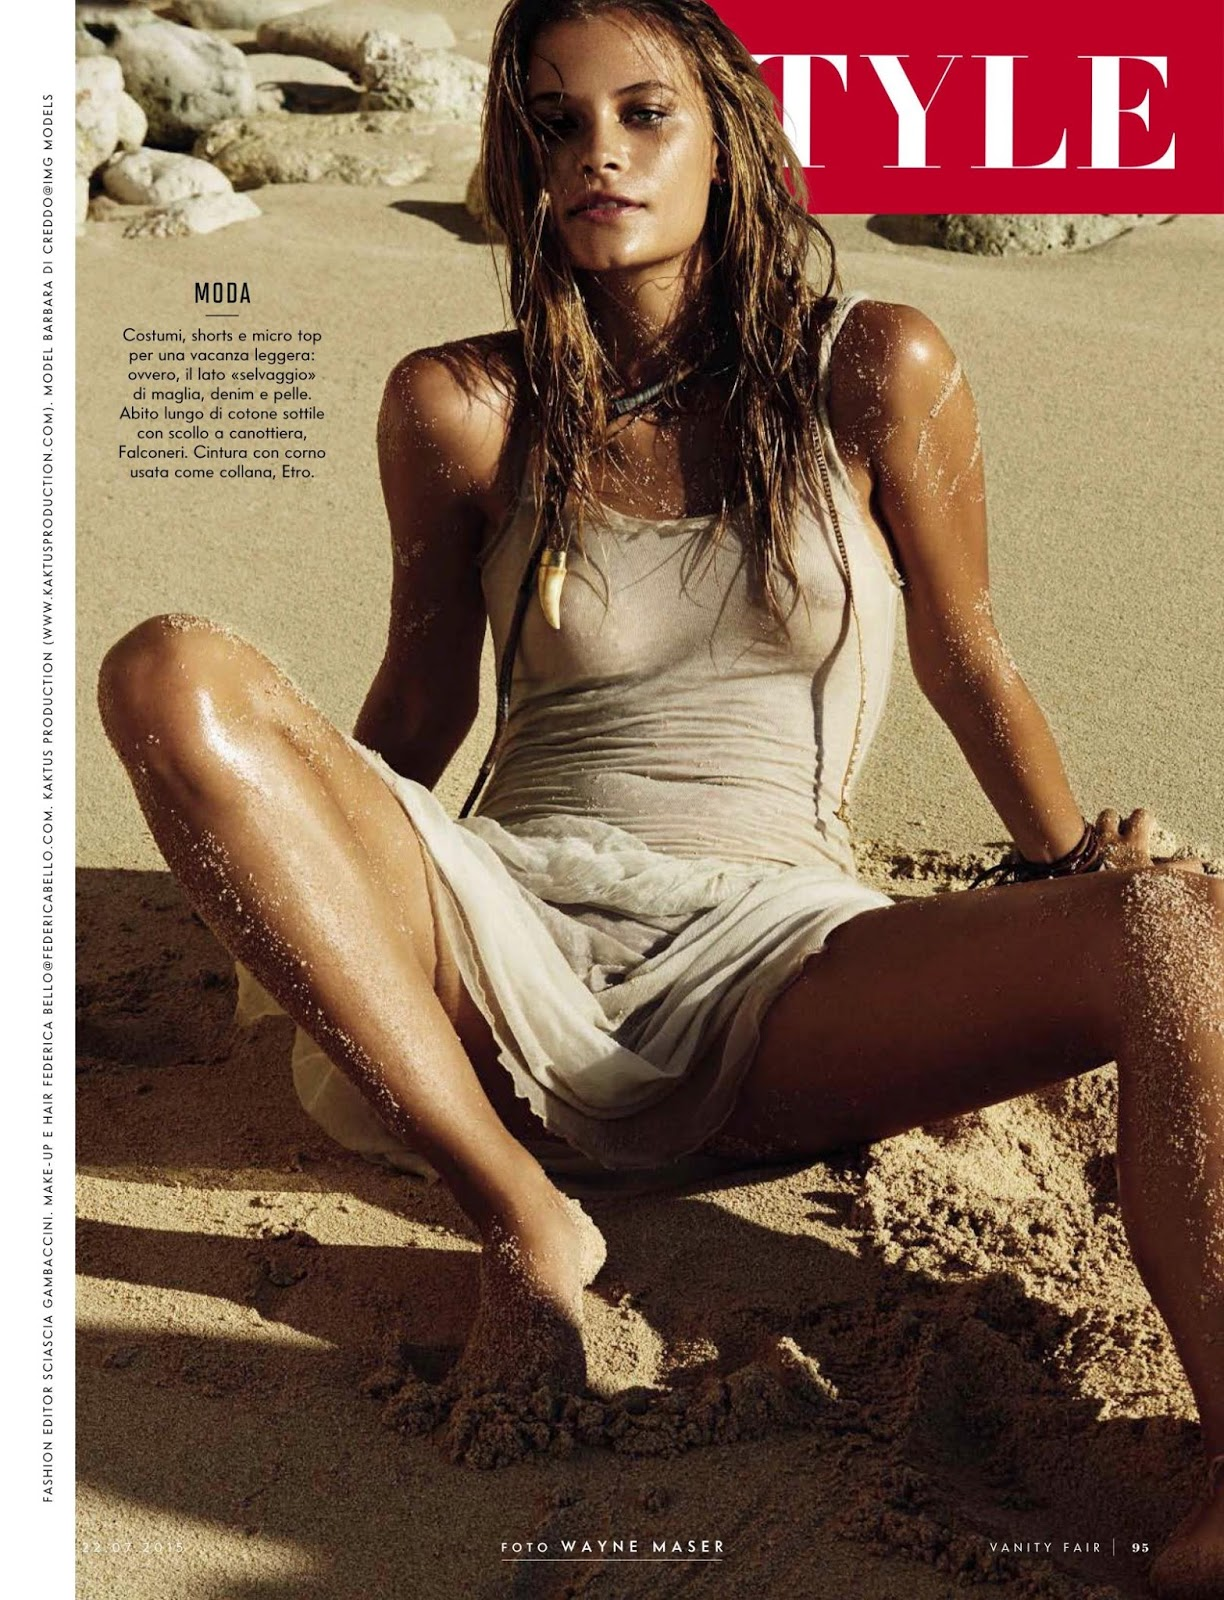 Hot Barbara Di Creddo nudes (74 pics), Boobs